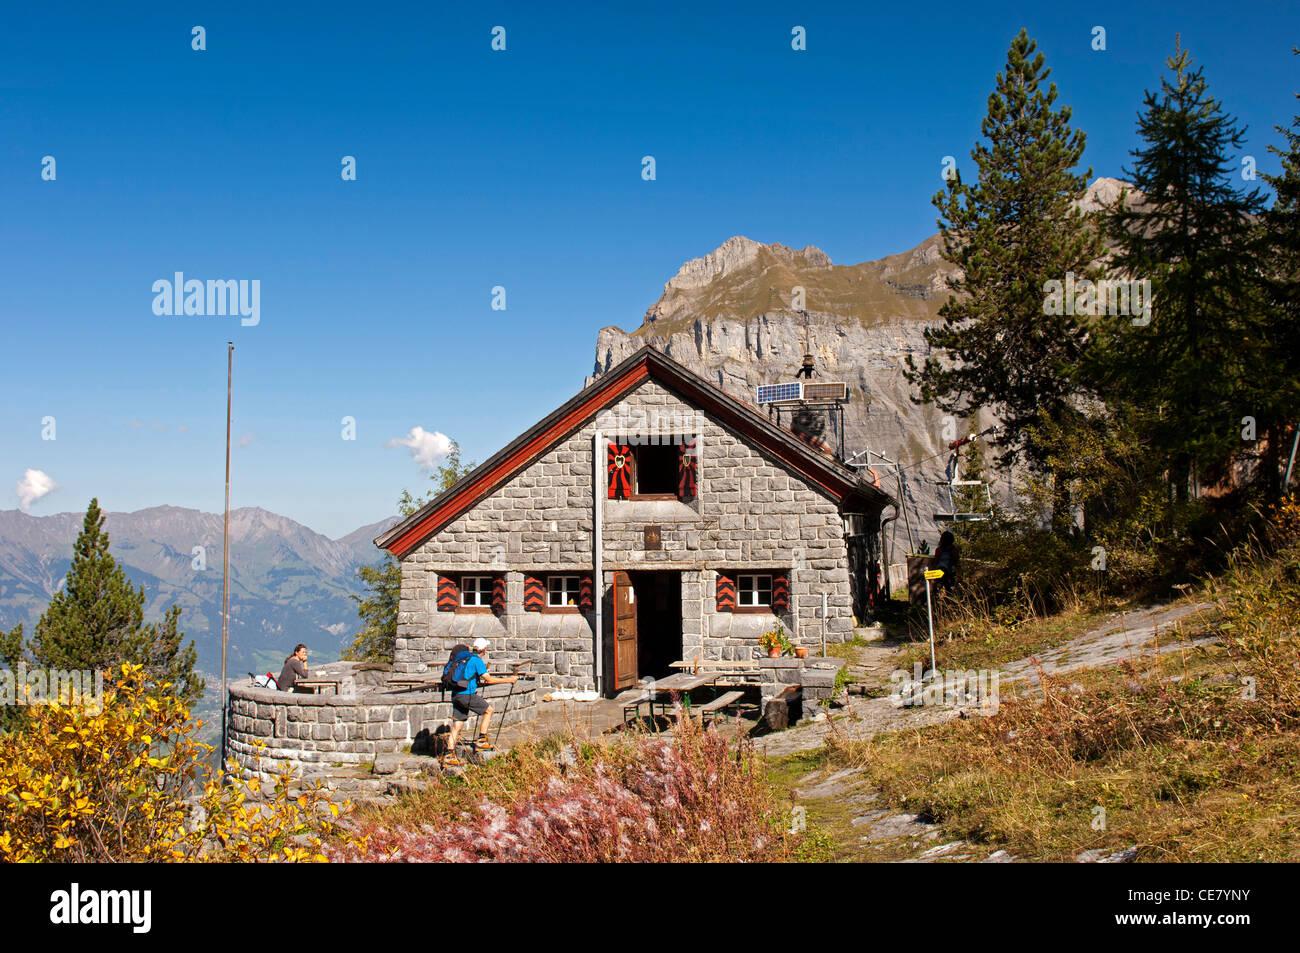 Mountain refuge Doldenhornhuette of the Swiss Alpine Club SAC, Kandersteg, Bernese Oberland, Switzerland - Stock Image